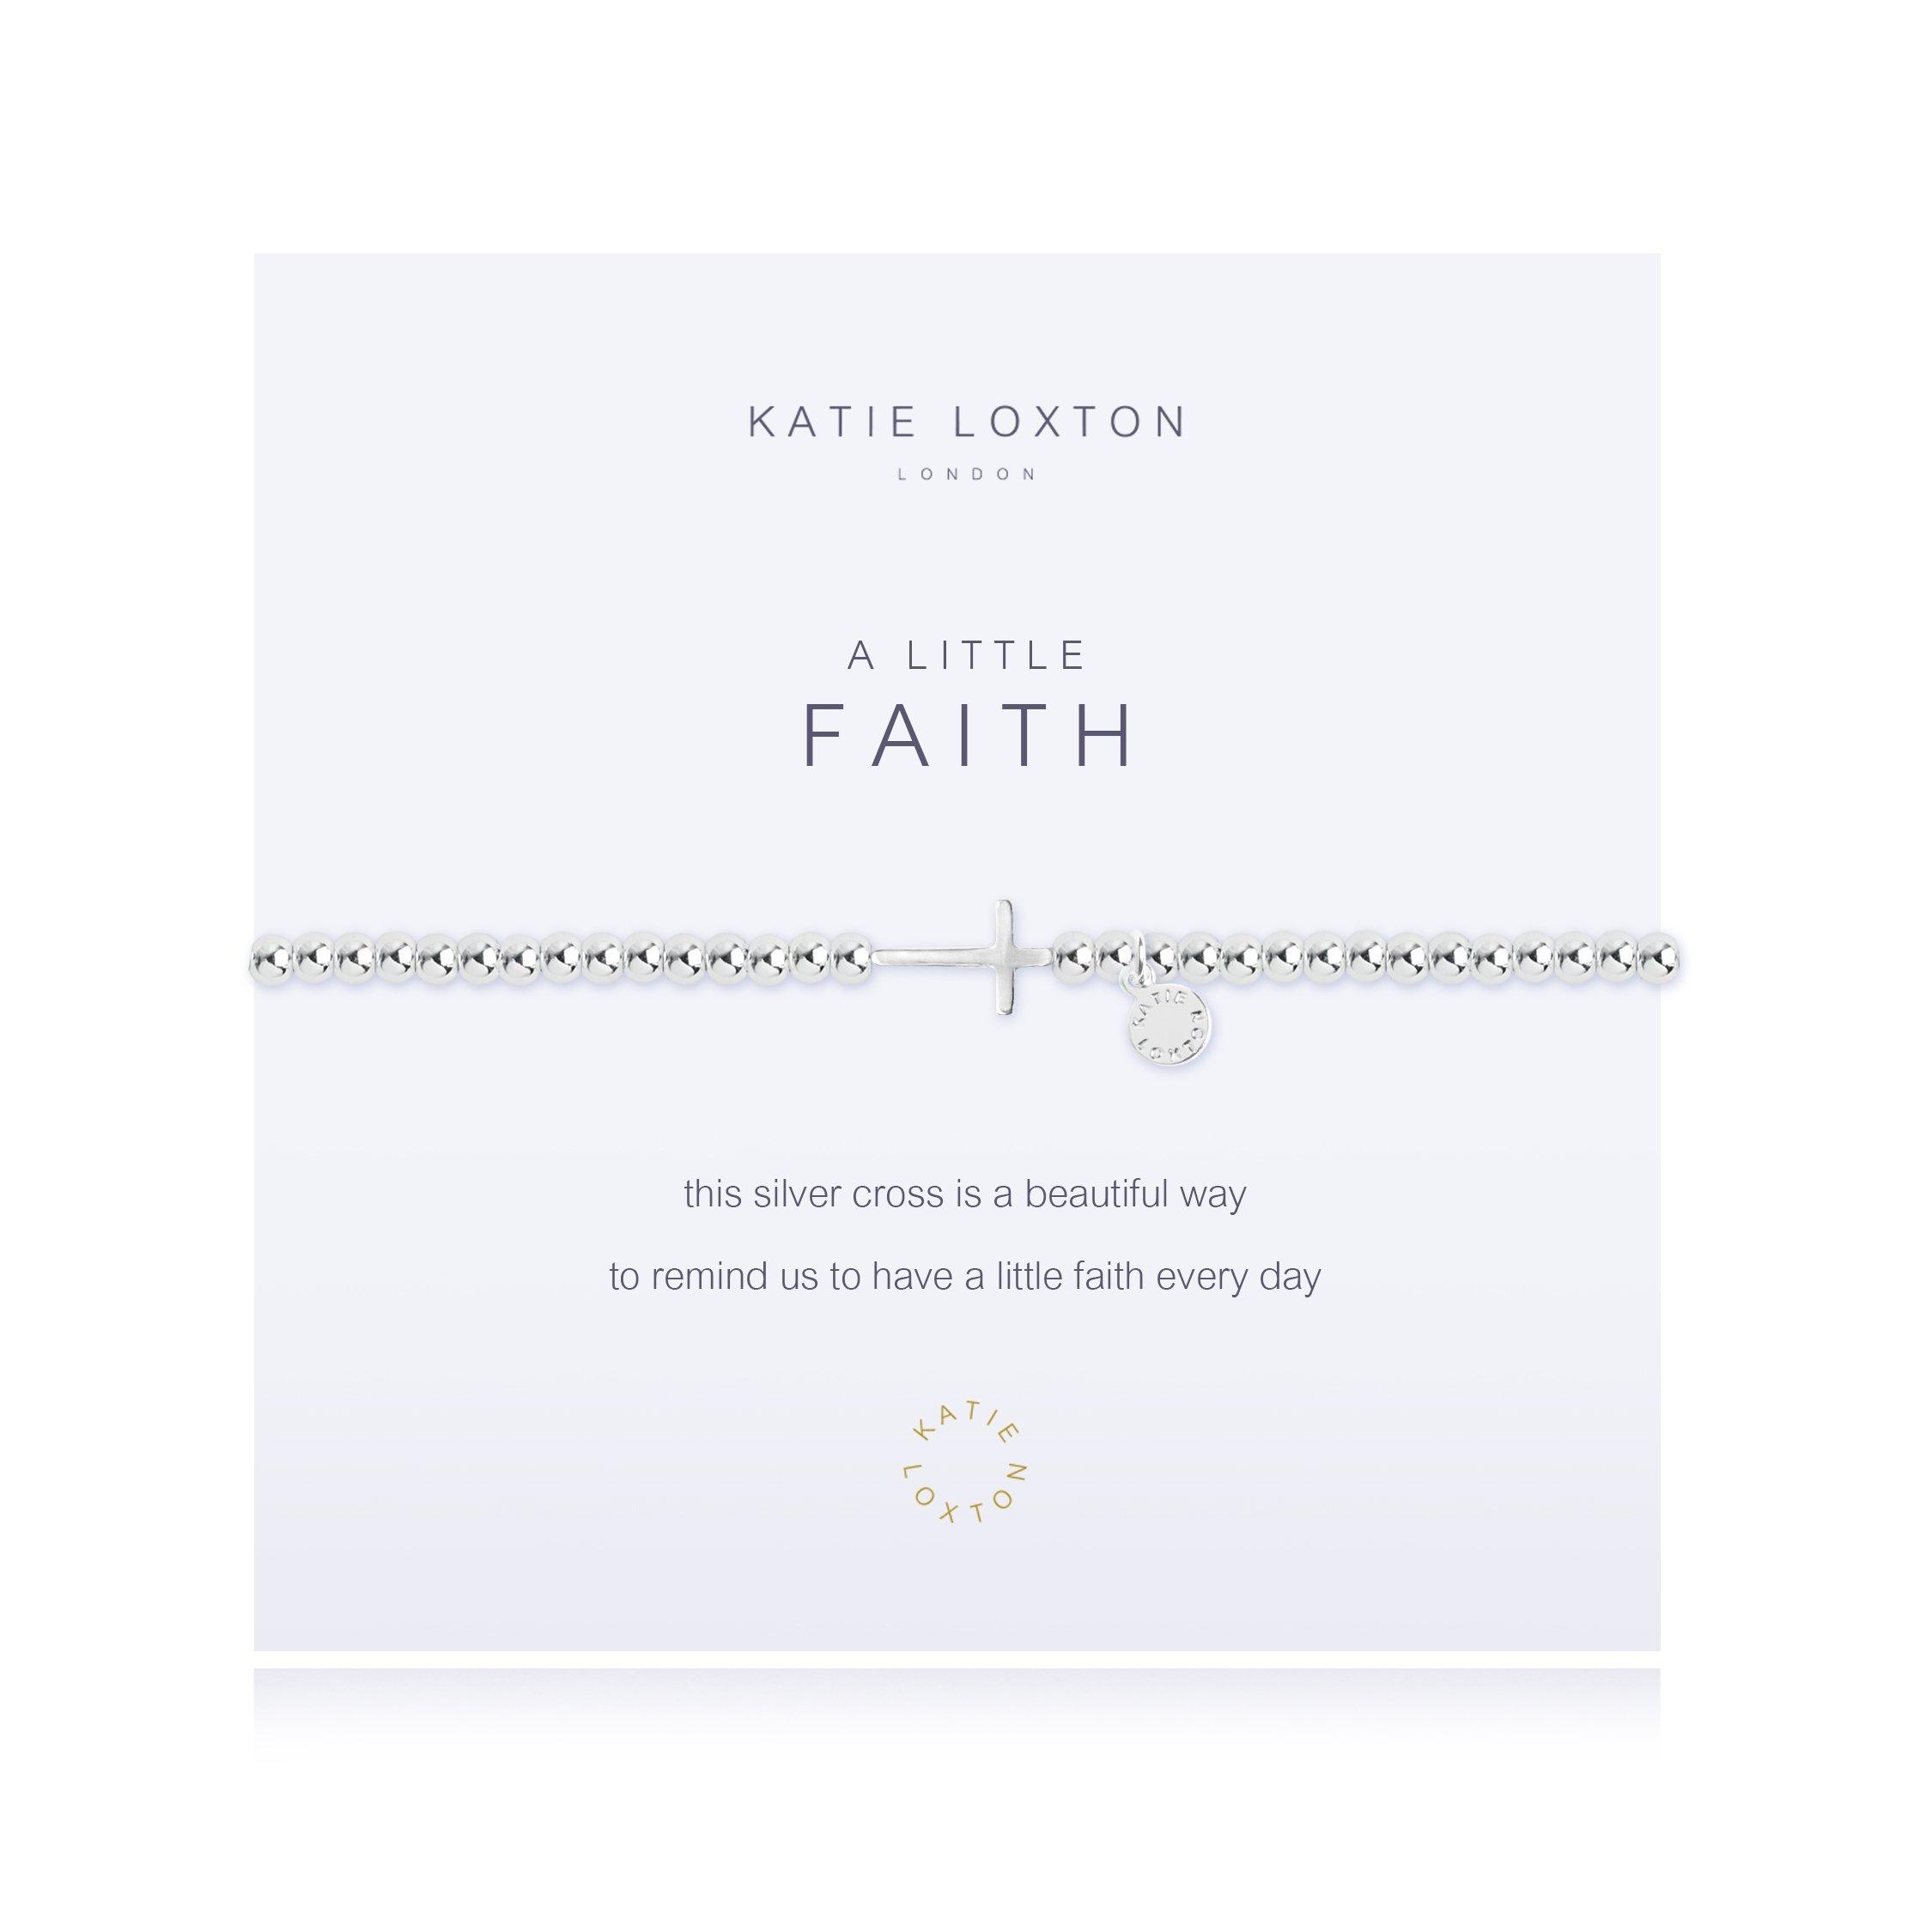 Katie Loxton A Little Faith Horizontal Cross Silver Women's Stretch Adjustable Charm Bangle Bracelet by Katie Loxton